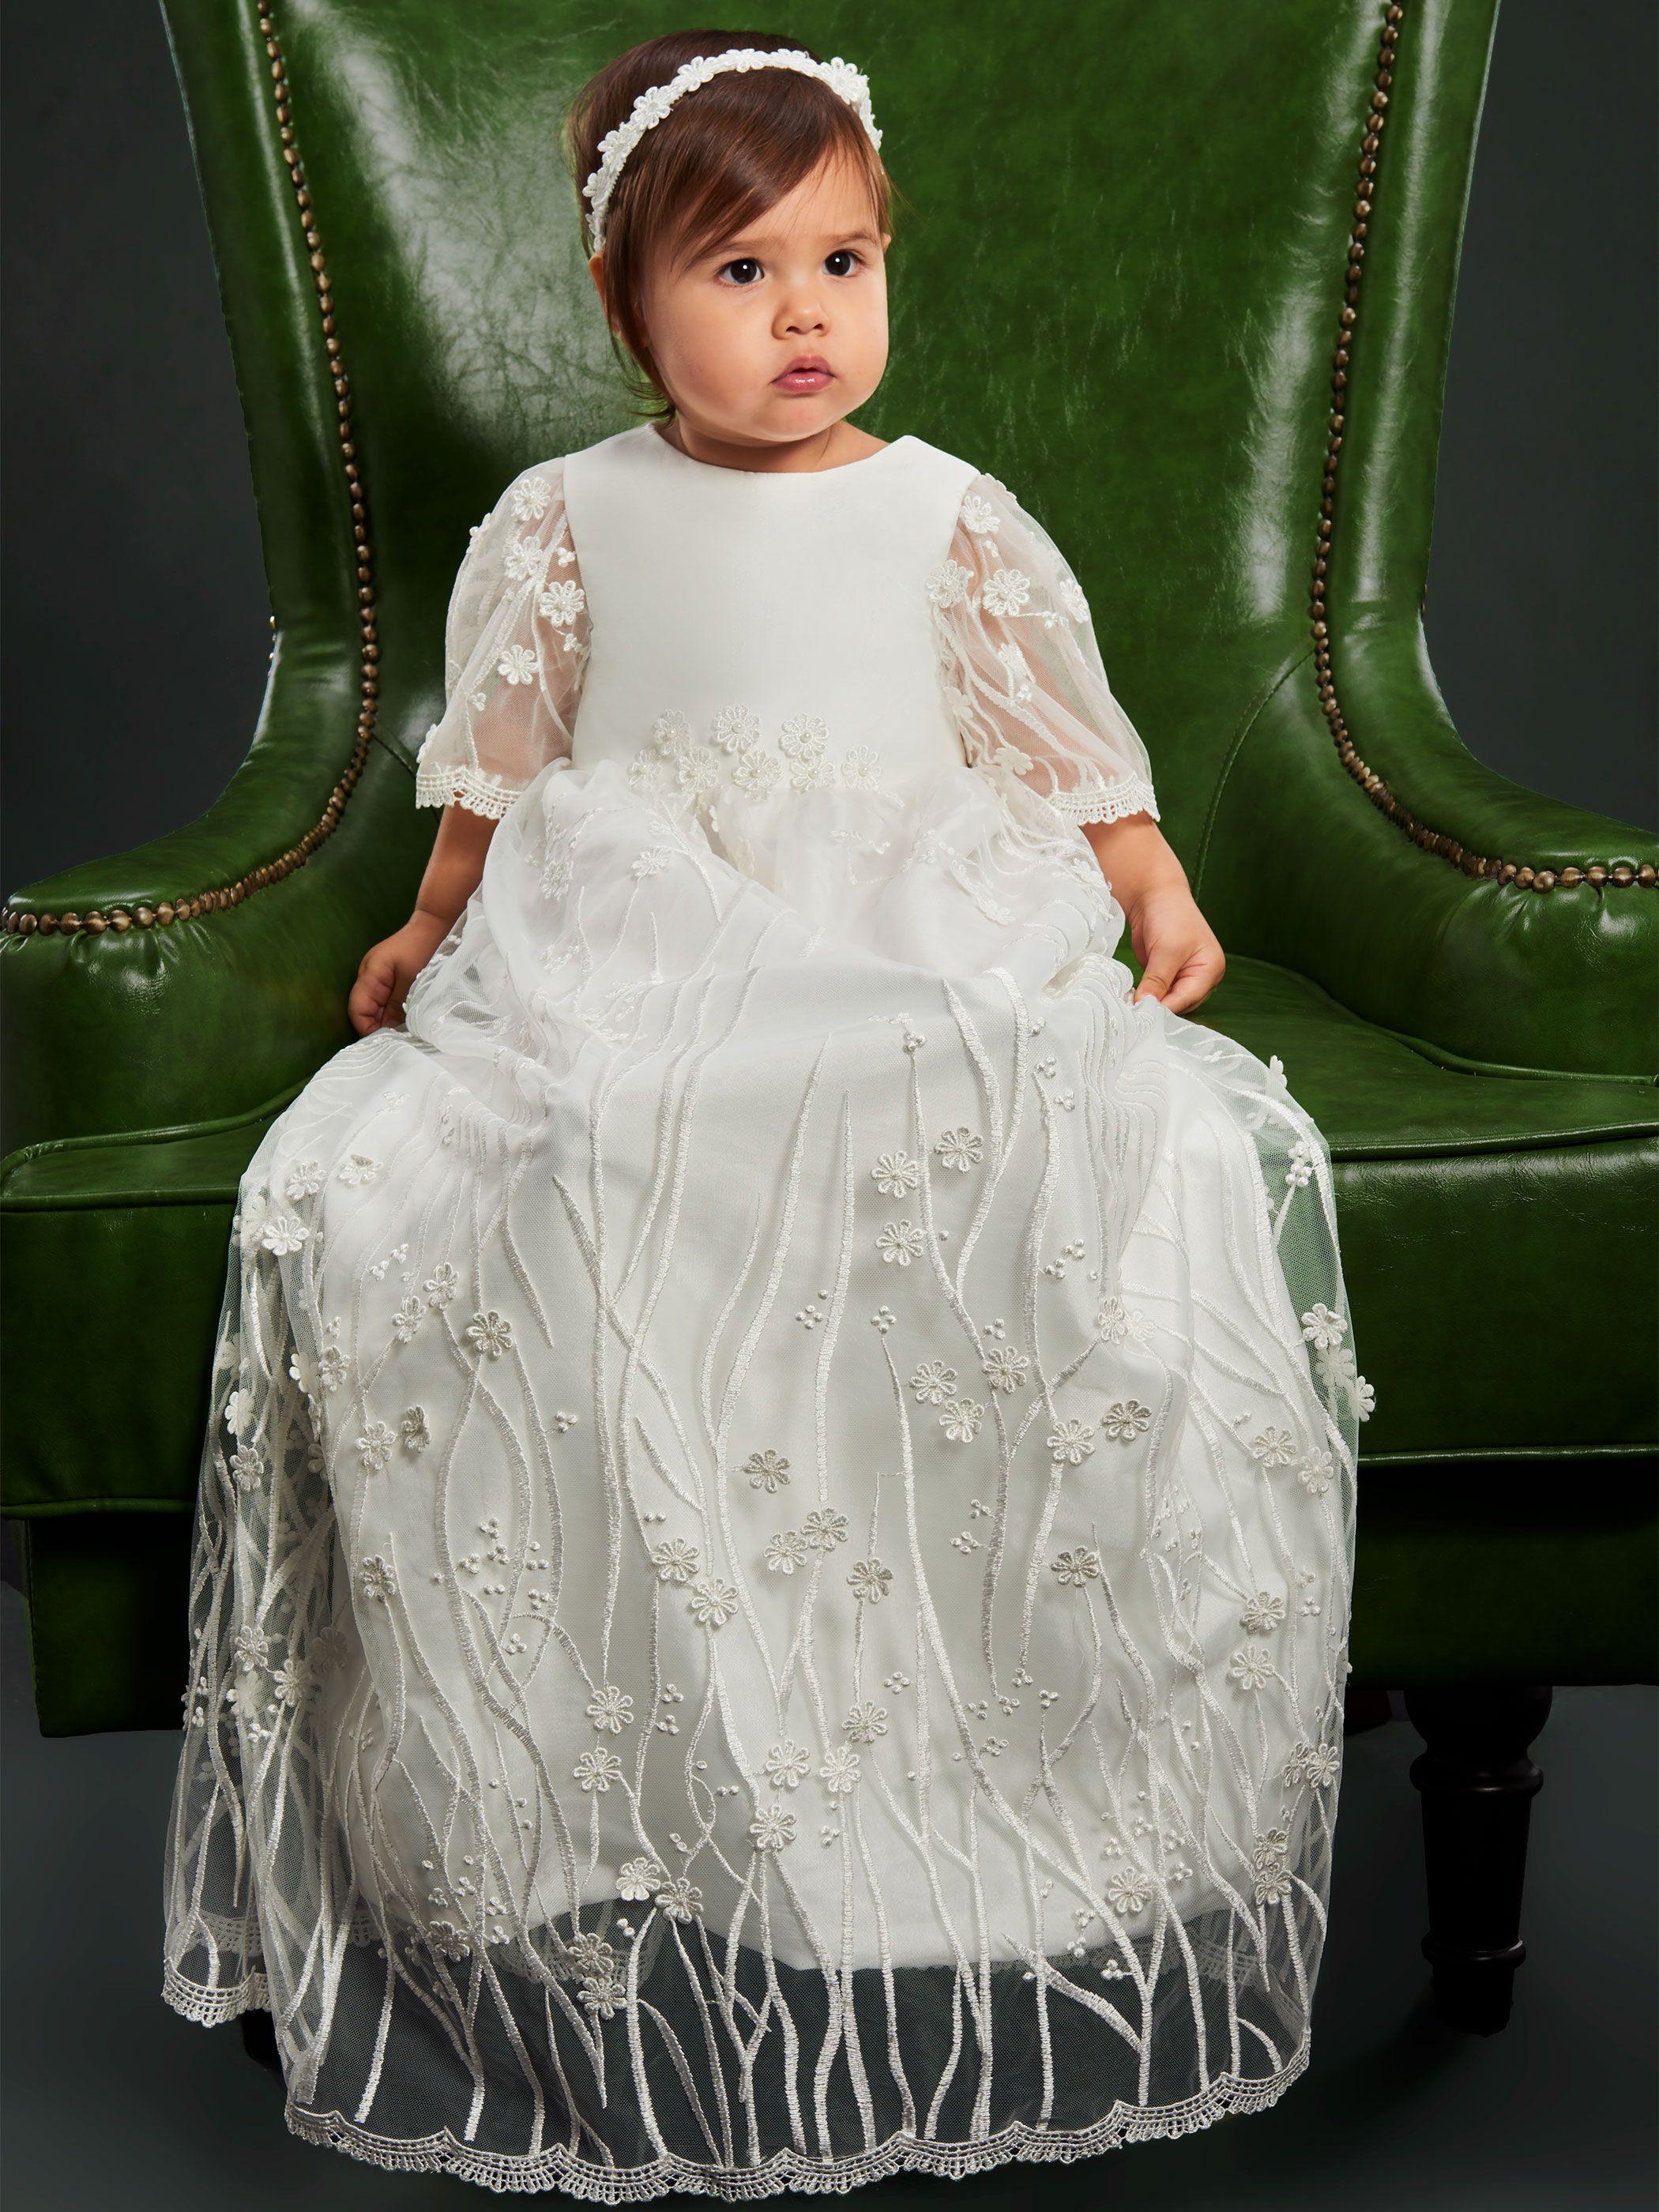 835291988519  70.99 Dresswe.com SUPPLIES Scoop Neck Half Sleeves Lace Christening ...